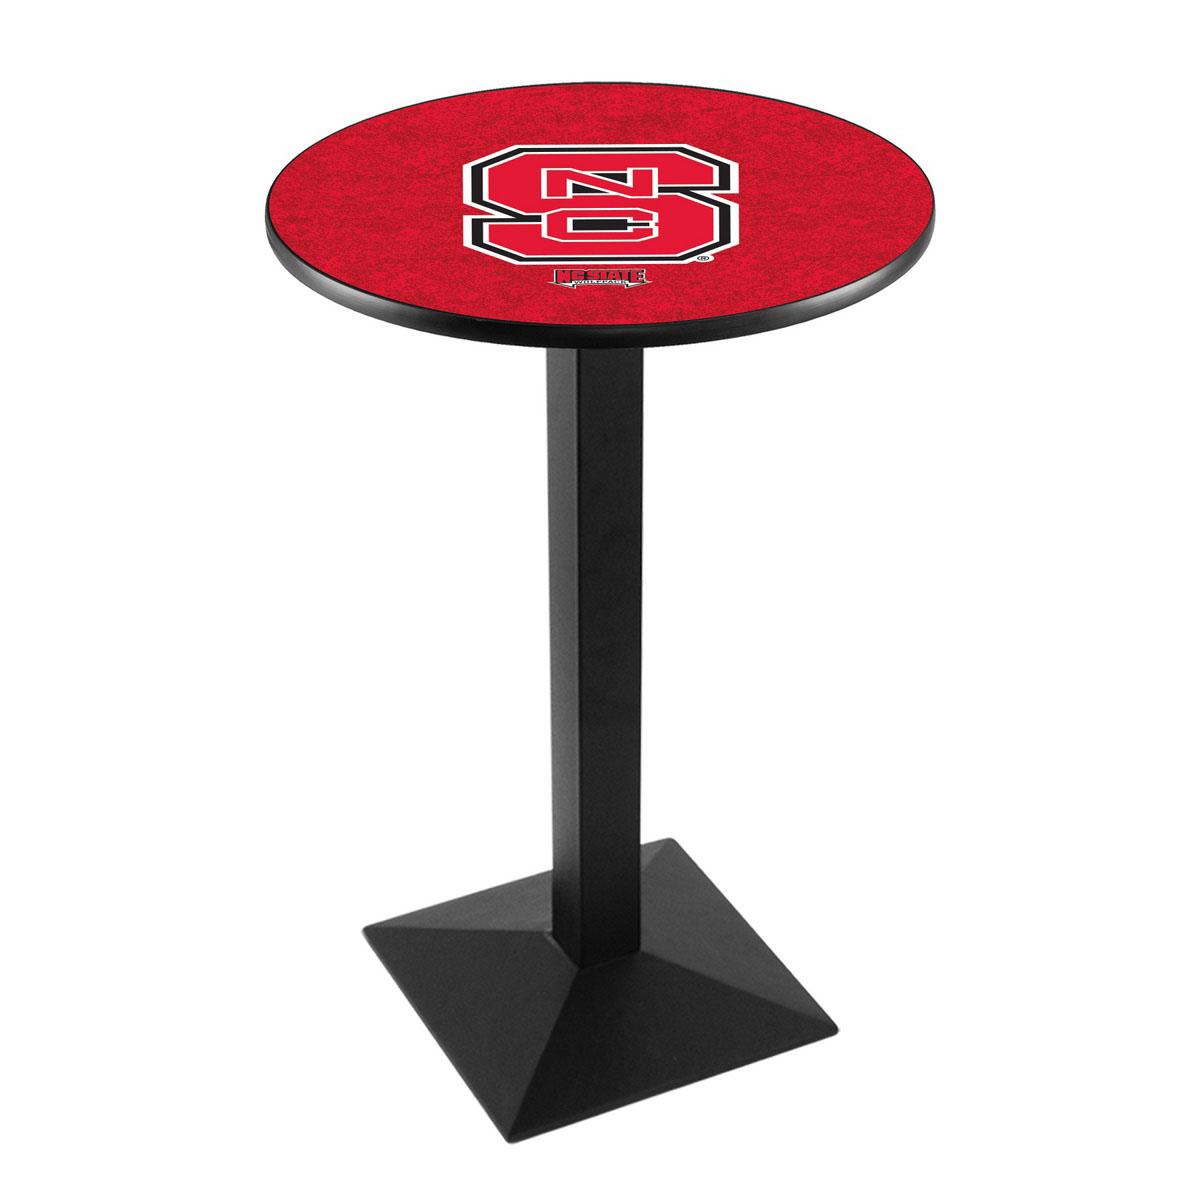 Superb-quality North Carolina State University Logo Pub Bar Table Square Stand Product Photo